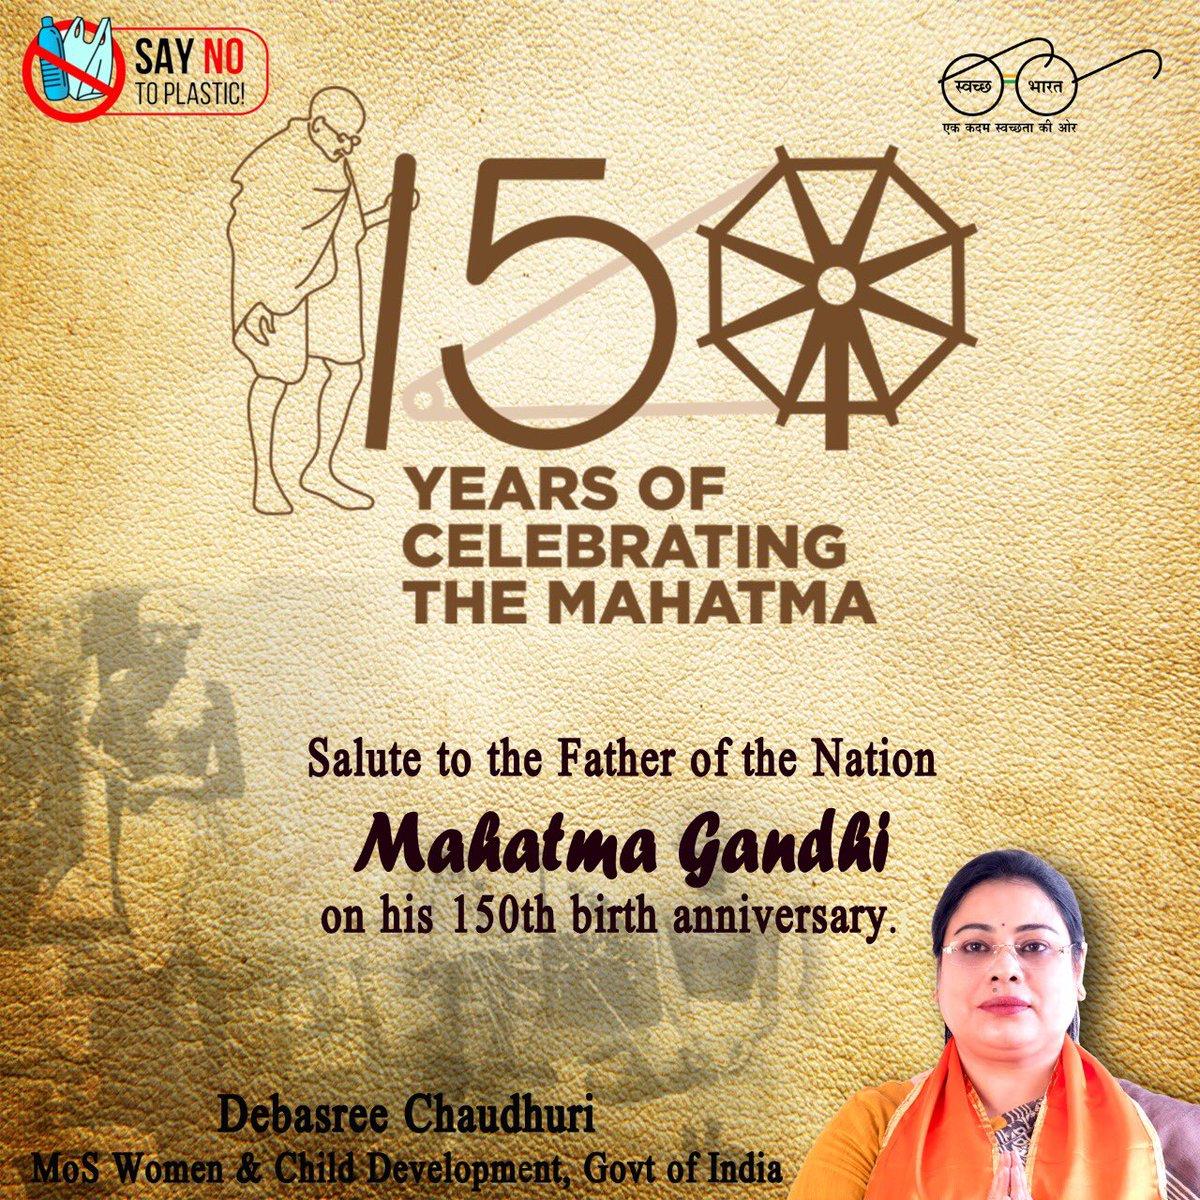 #Gandhi150  #SayNoToPlastic   @PMOIndia  @MinistryWCD